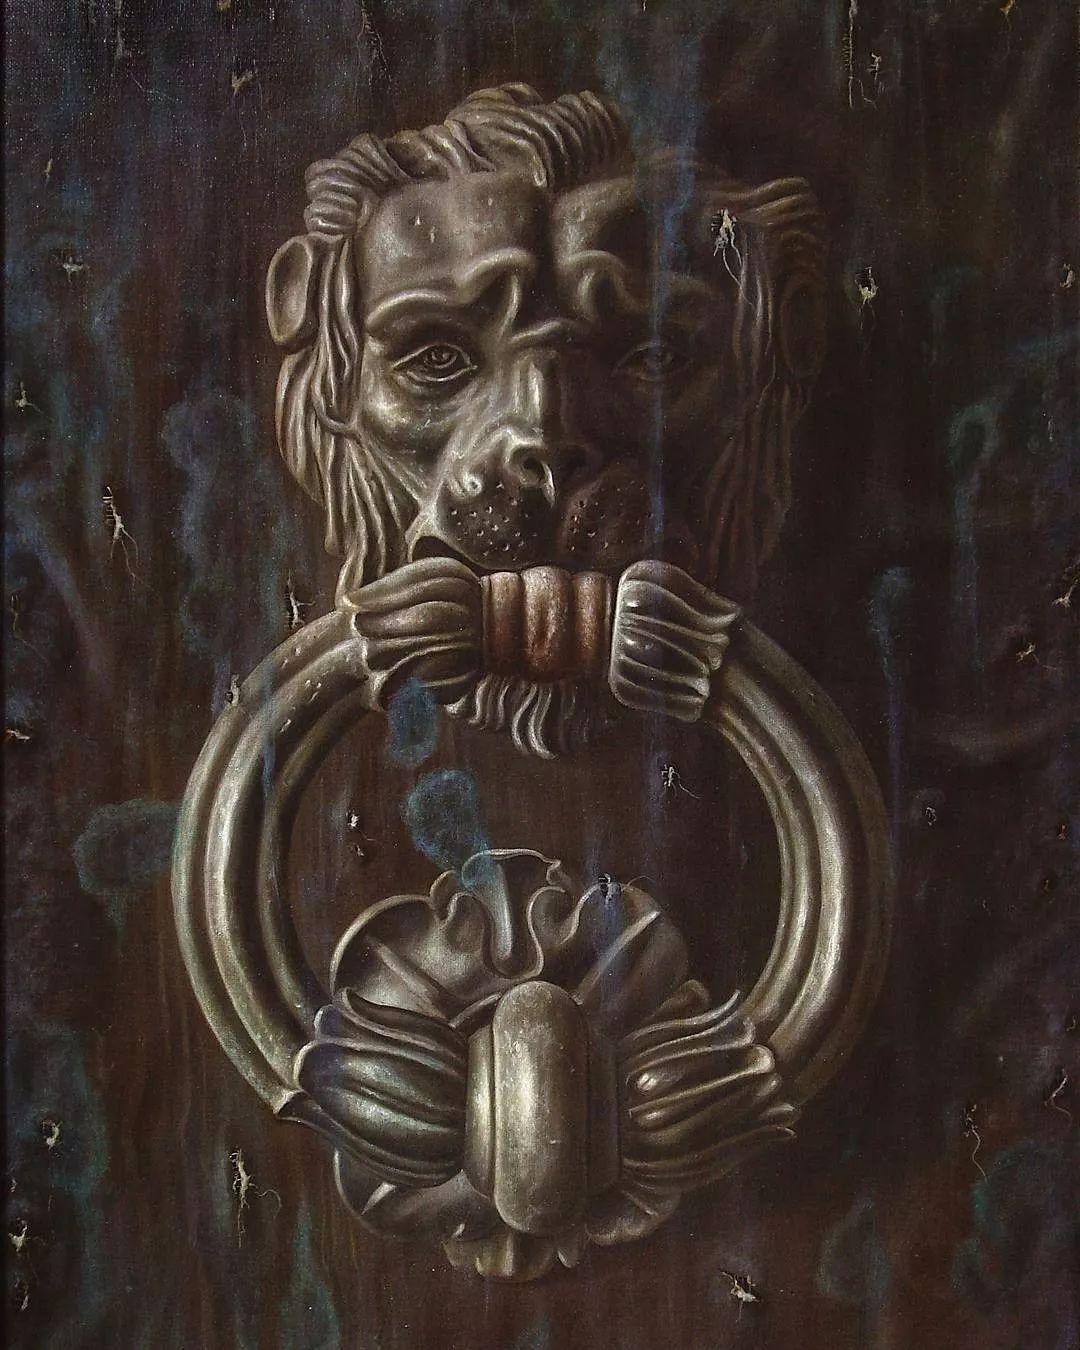 重金属质感满满 意大利画家Gioacchino Passini 三插图59